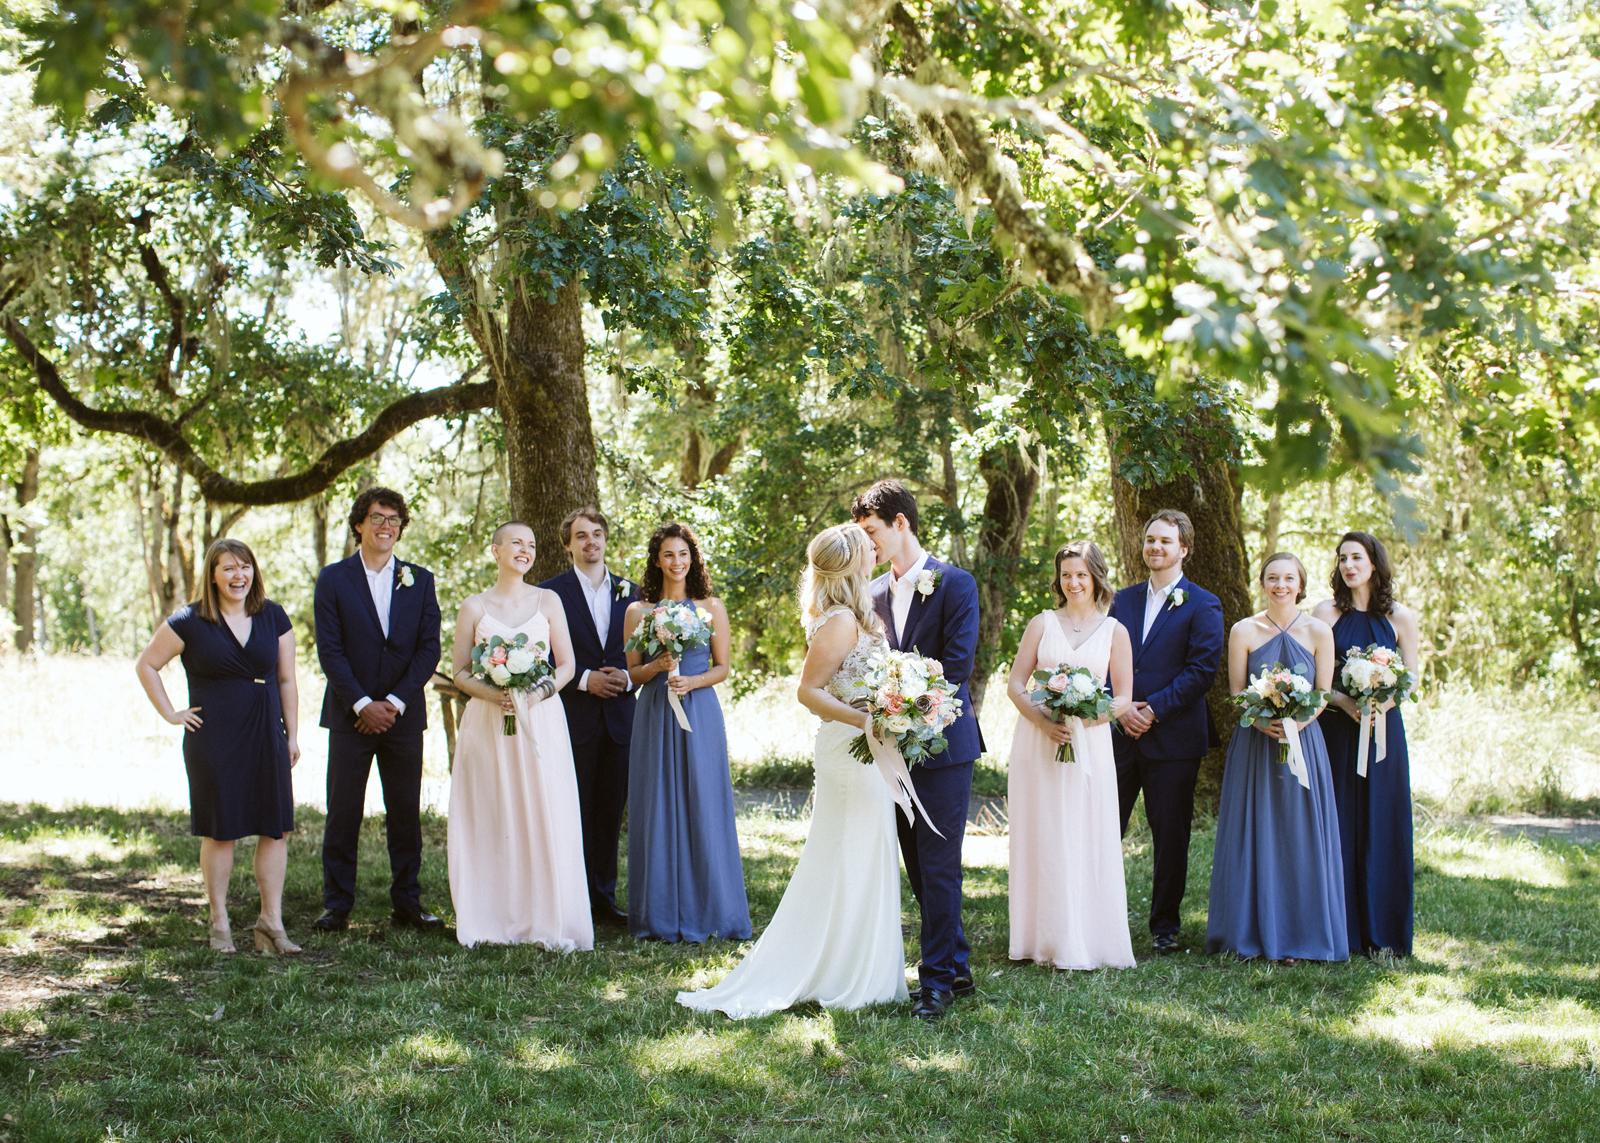 026-daronjackson-rachel-michael-wedding-mtpisgah.jpg